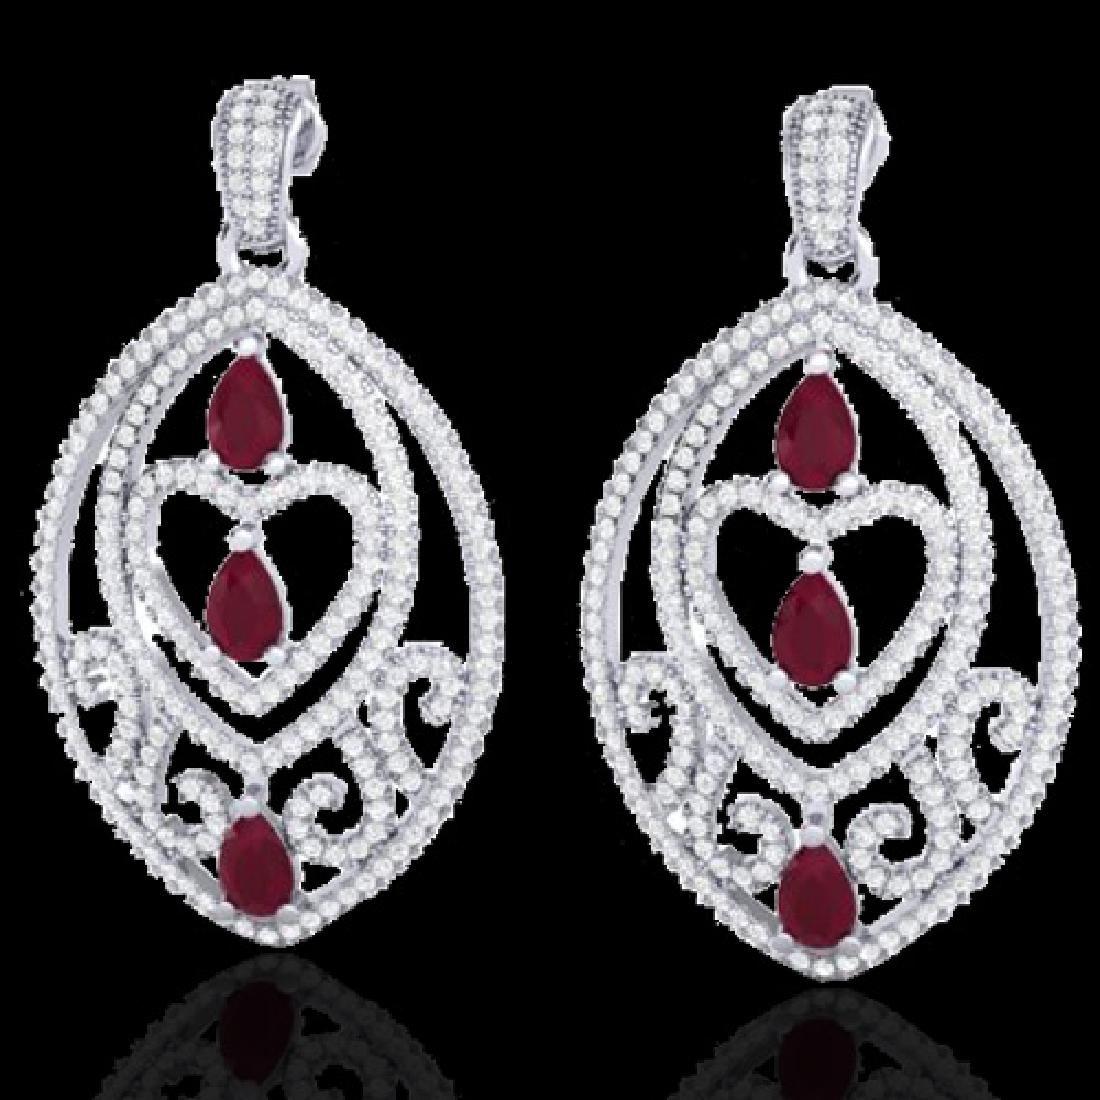 7 CTW Ruby & Micro Pave VS/SI Diamond Heart Earrings